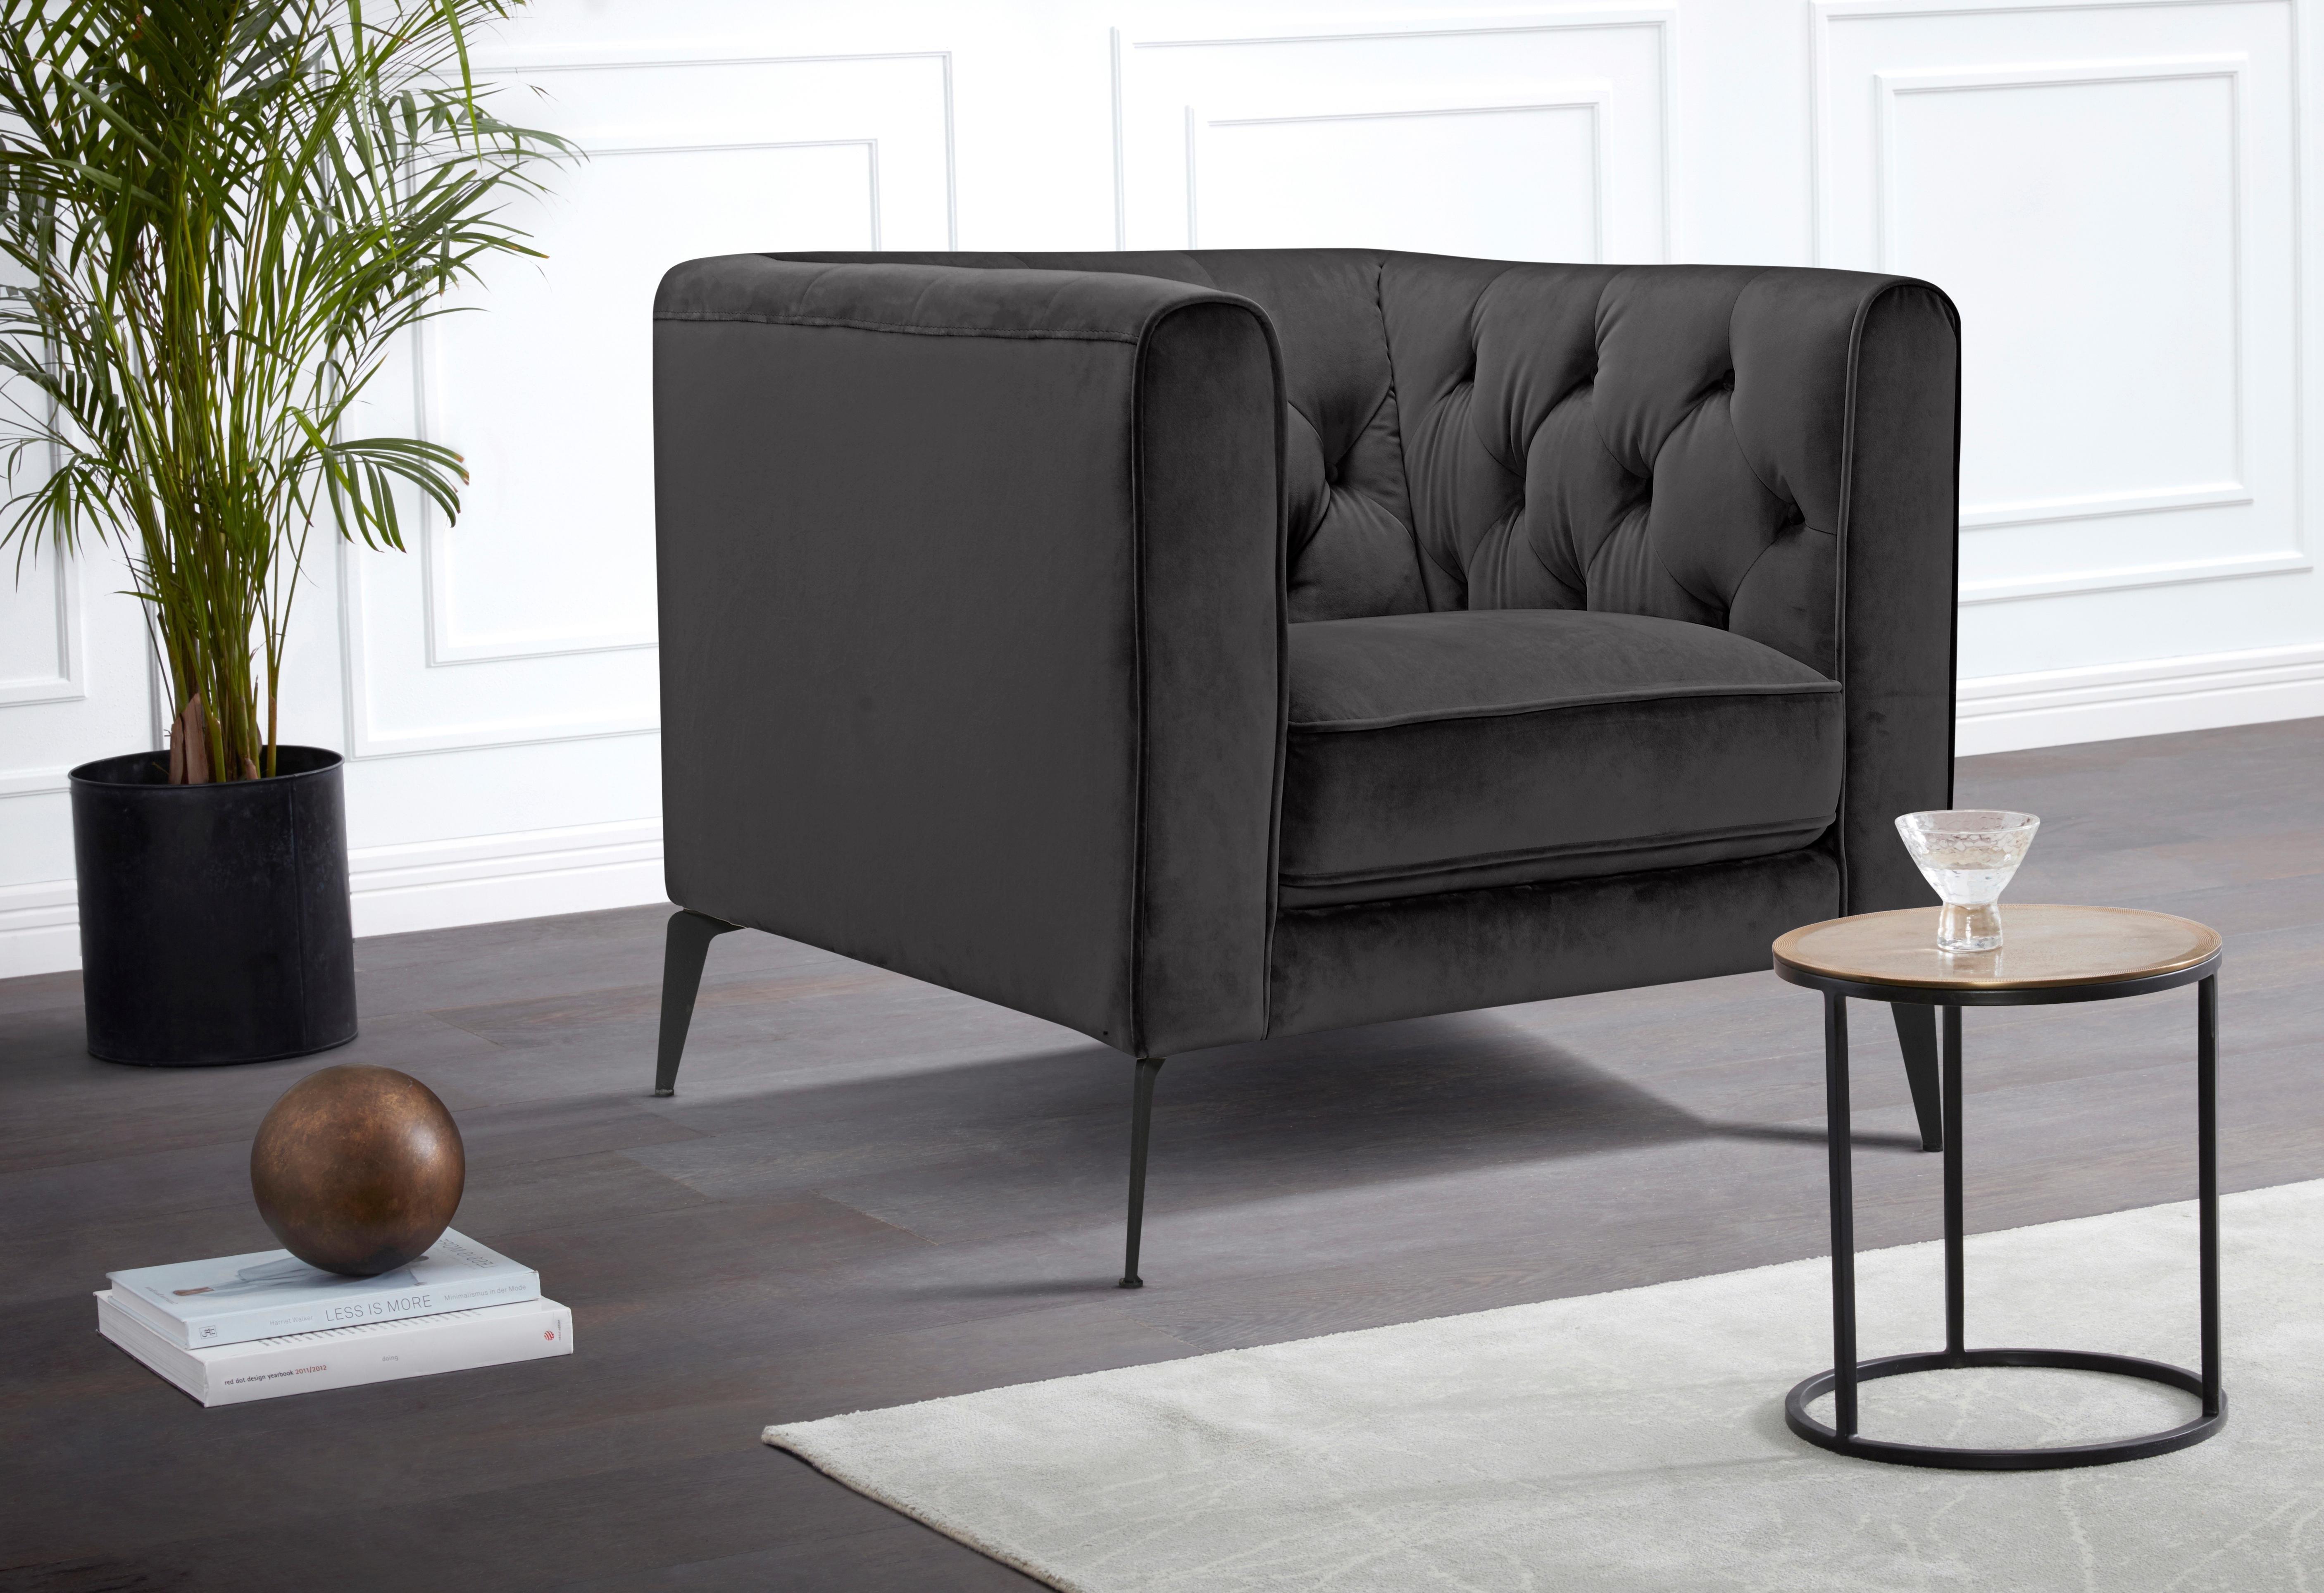 Leonique fauteuil »Narmada« - verschillende betaalmethodes